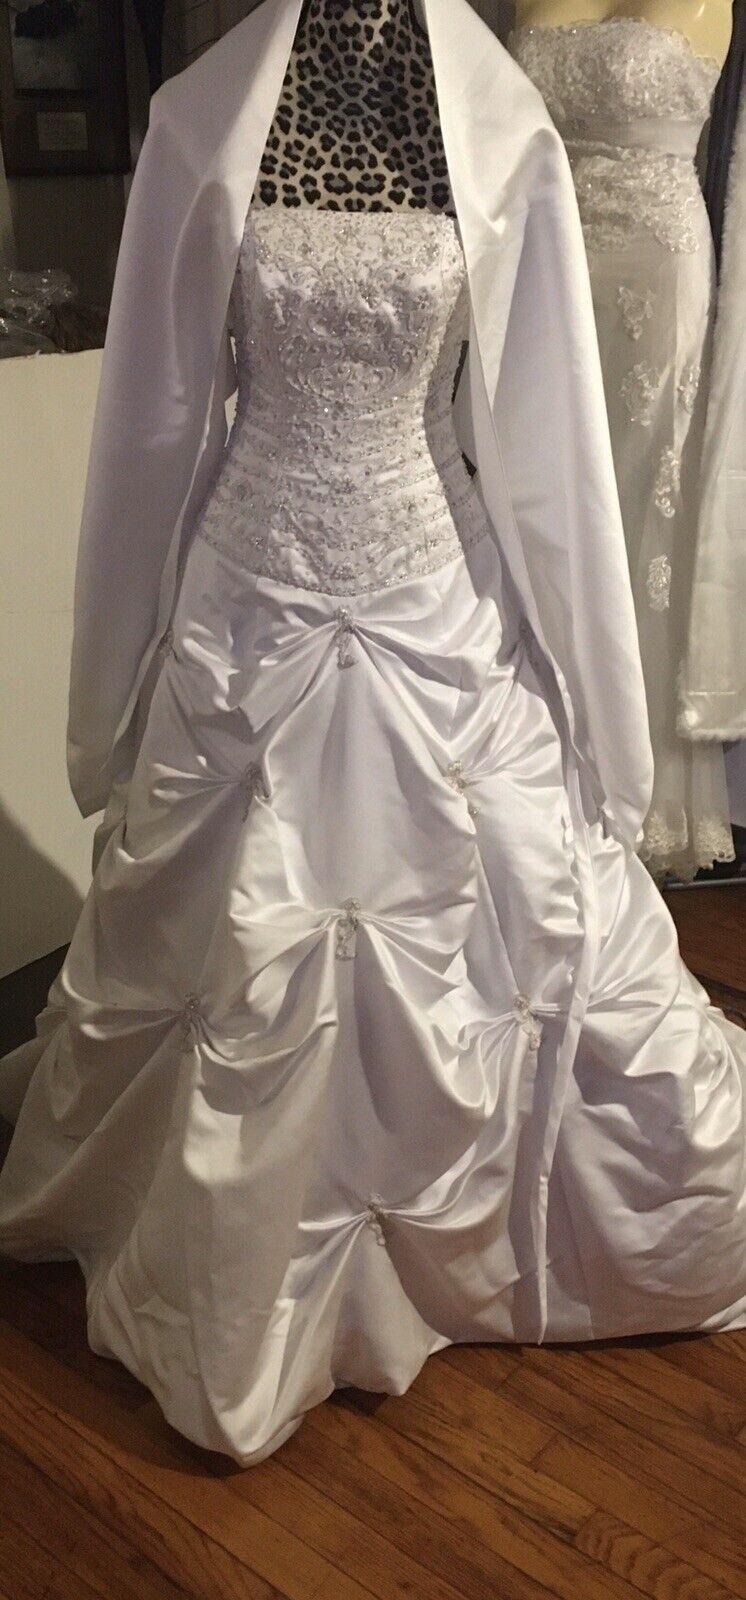 Bridal Wedding Dress IVORY Ball Gown Satin Ruffle Lace Corset Open Back Sz 2 New